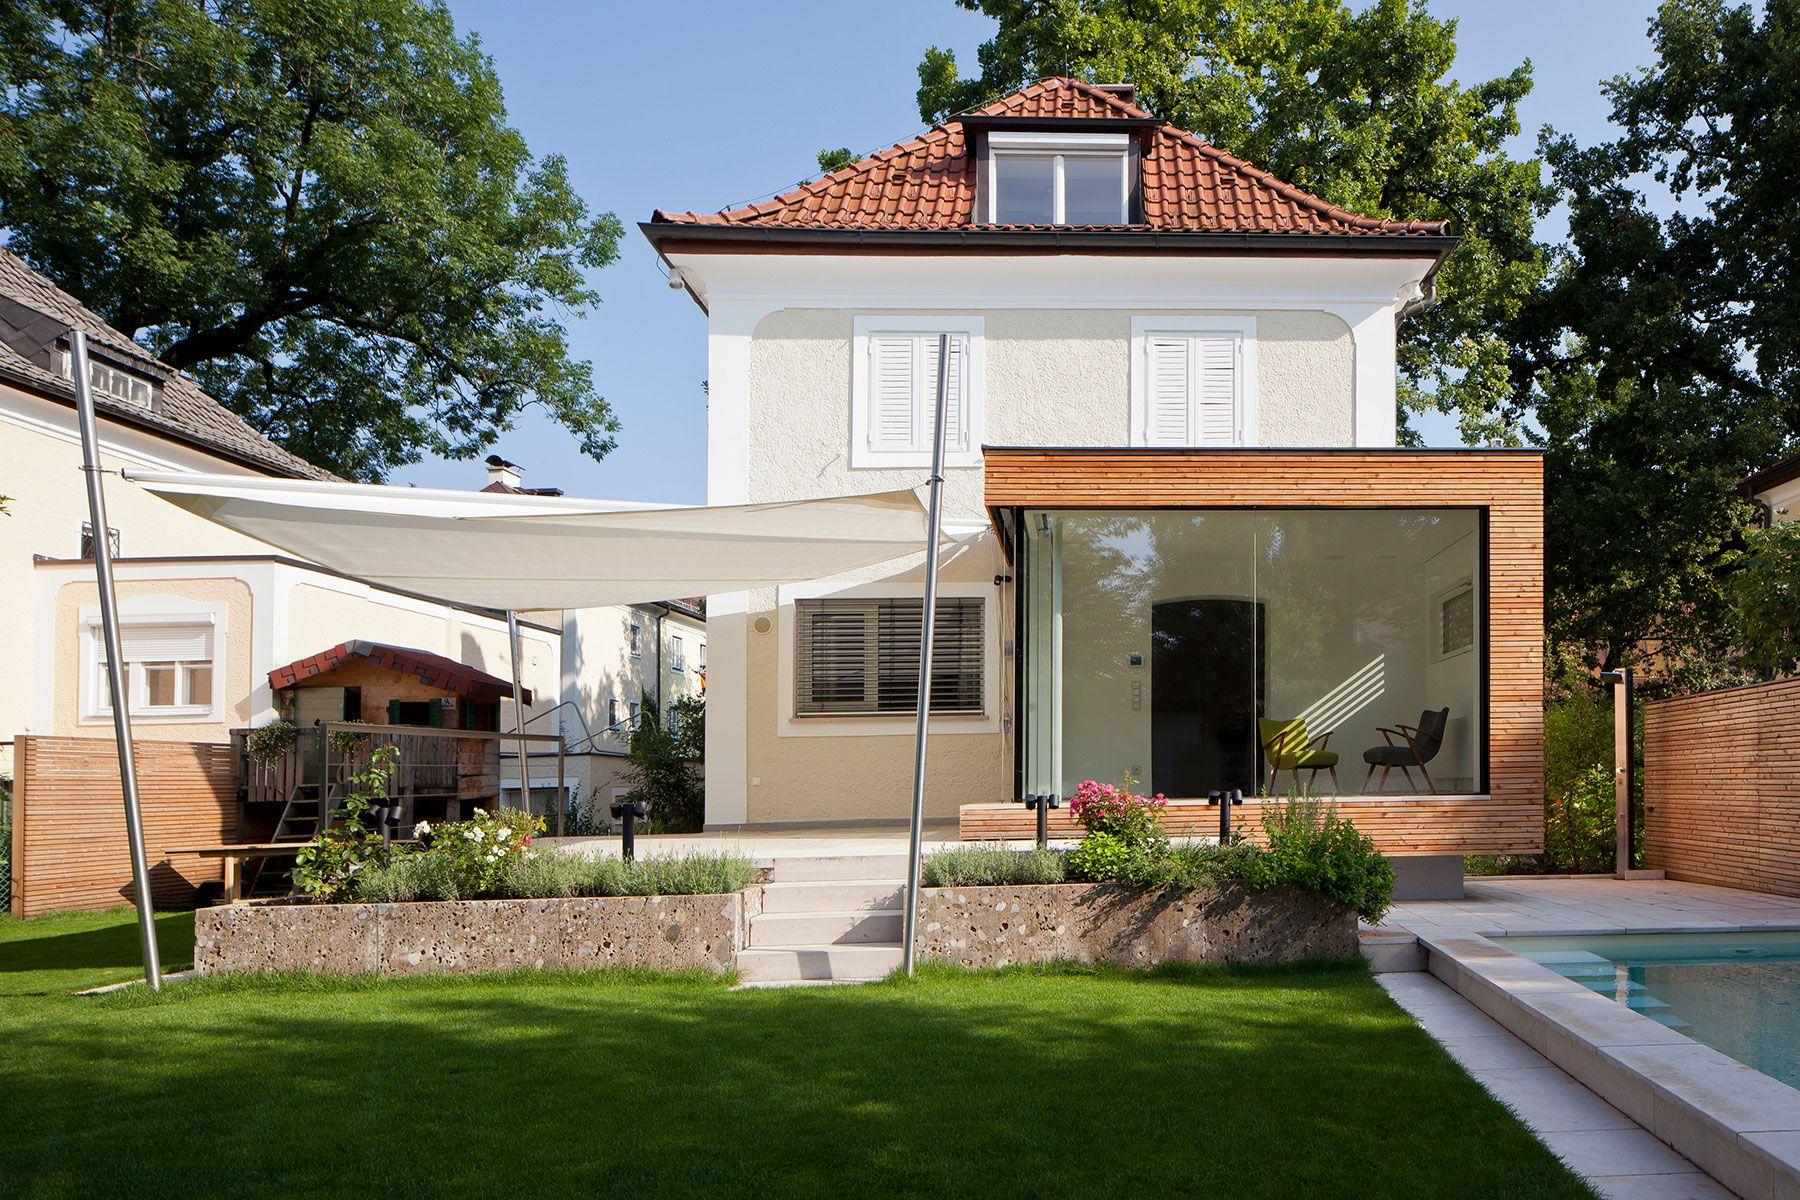 1000+ images about Haus Bayern, Hamburg and Island ...